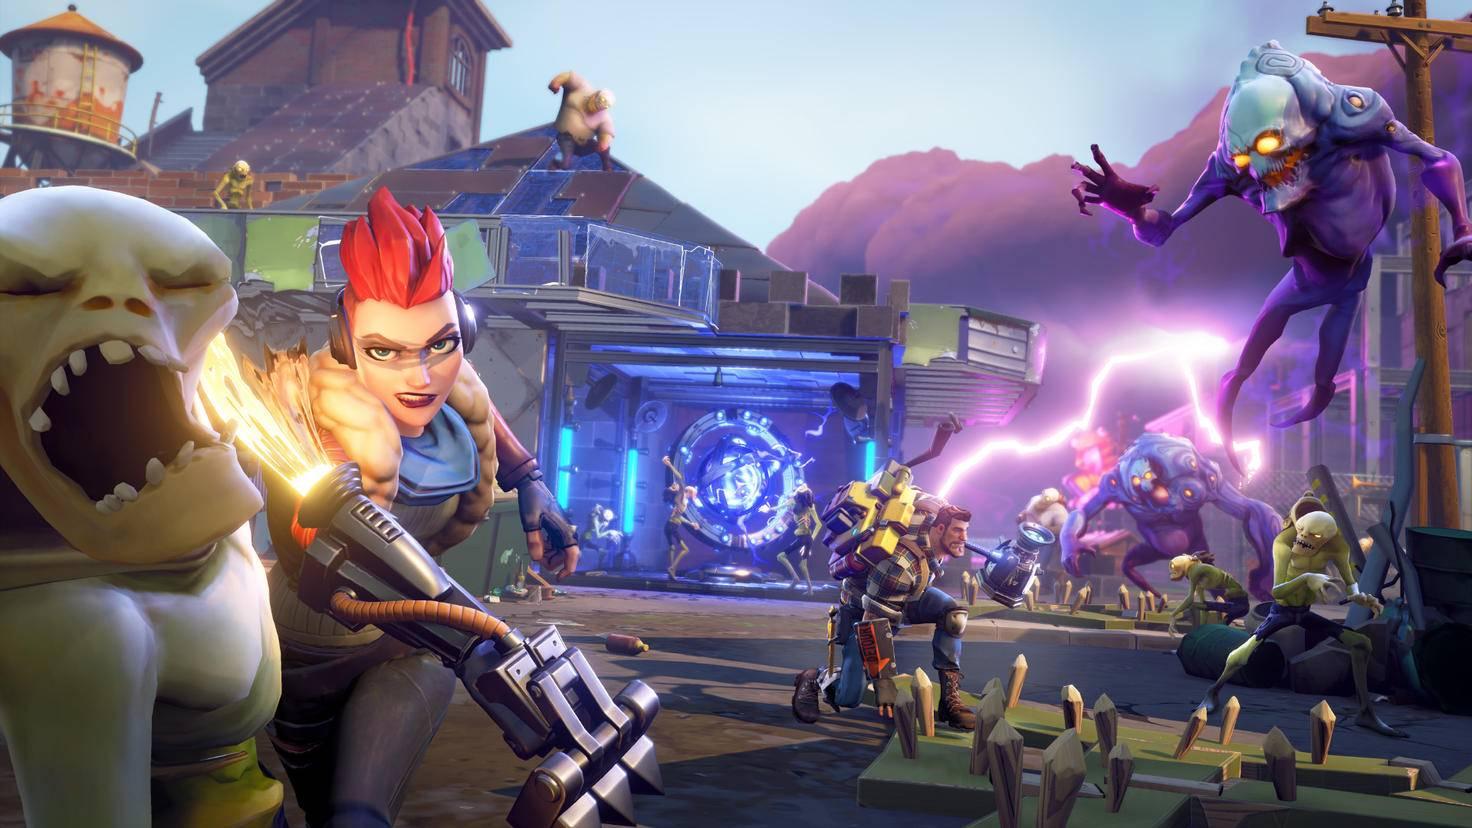 Free-to-Play-Release: Wann wird Fortnite: Rette die Welt